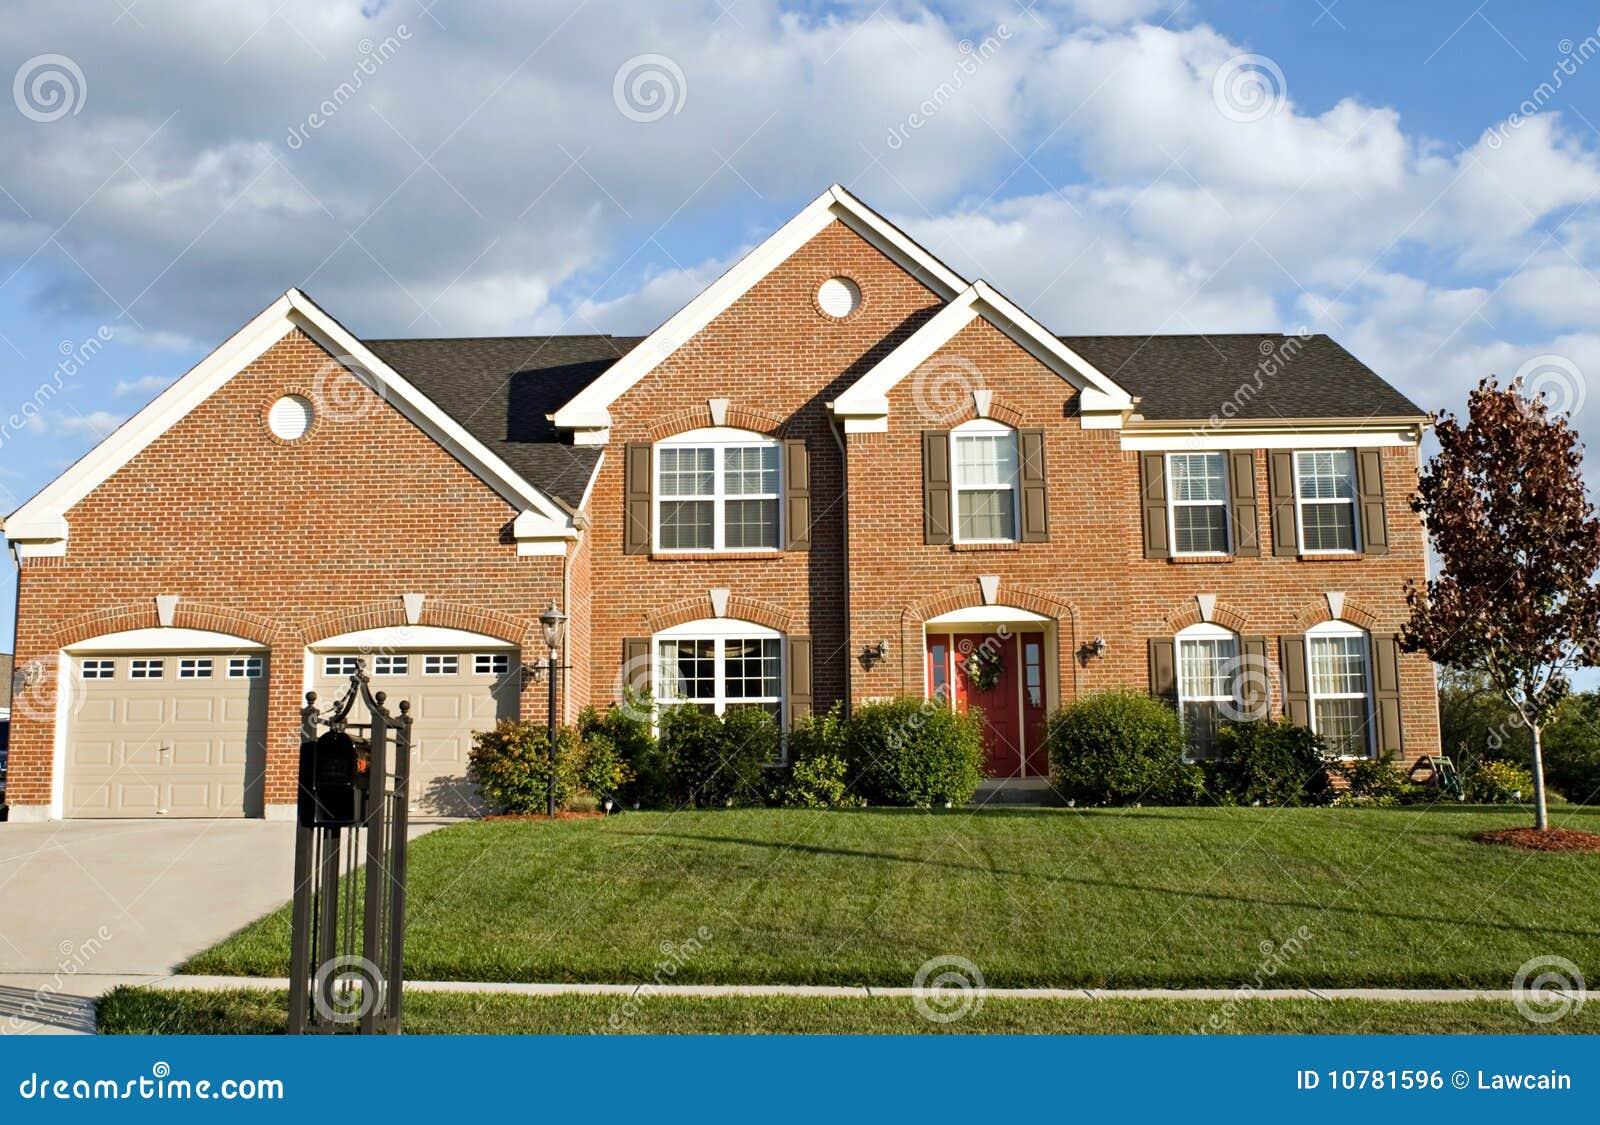 Two Story Brick House Royalty Free Stock Image Image